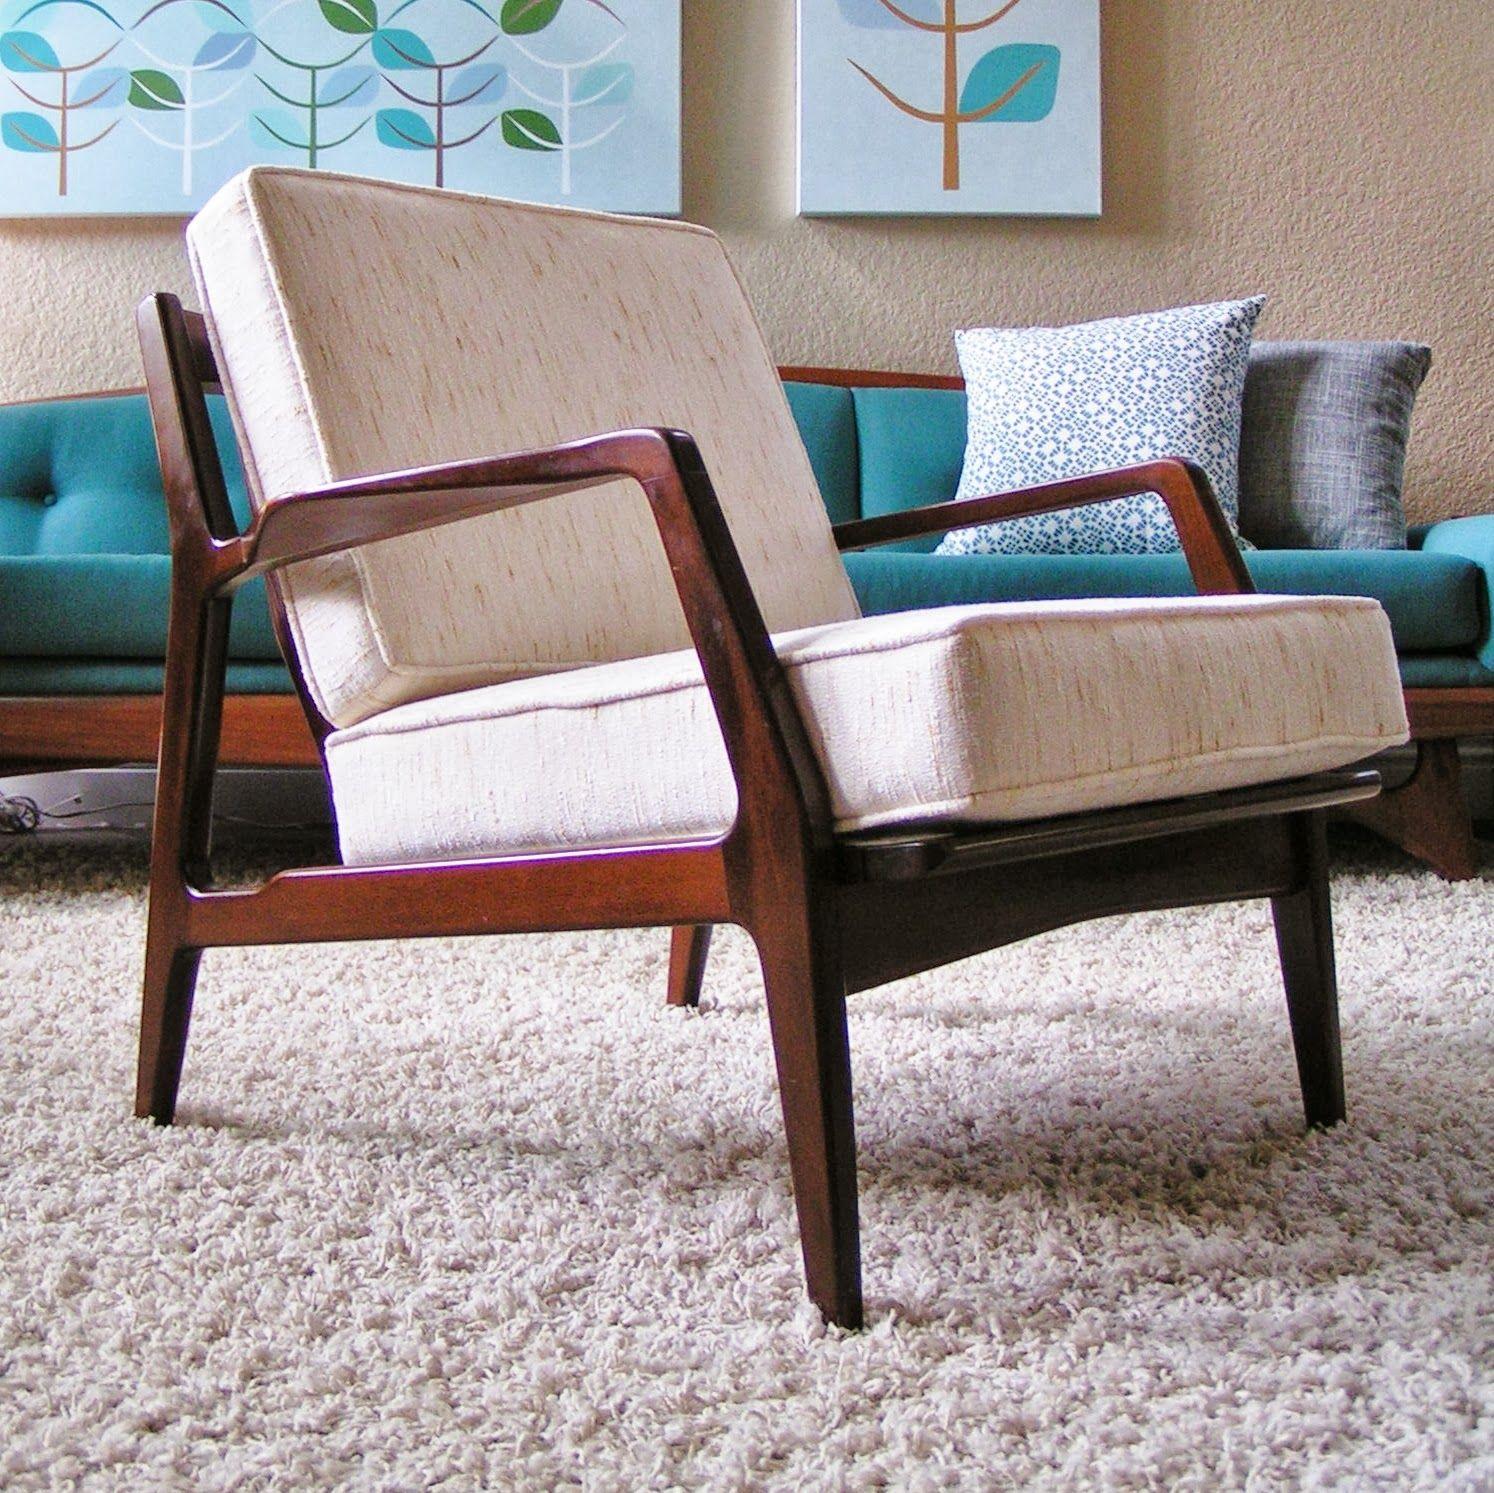 Gorgeous Mid Century Modern Teak Chair With White Cushions Mani